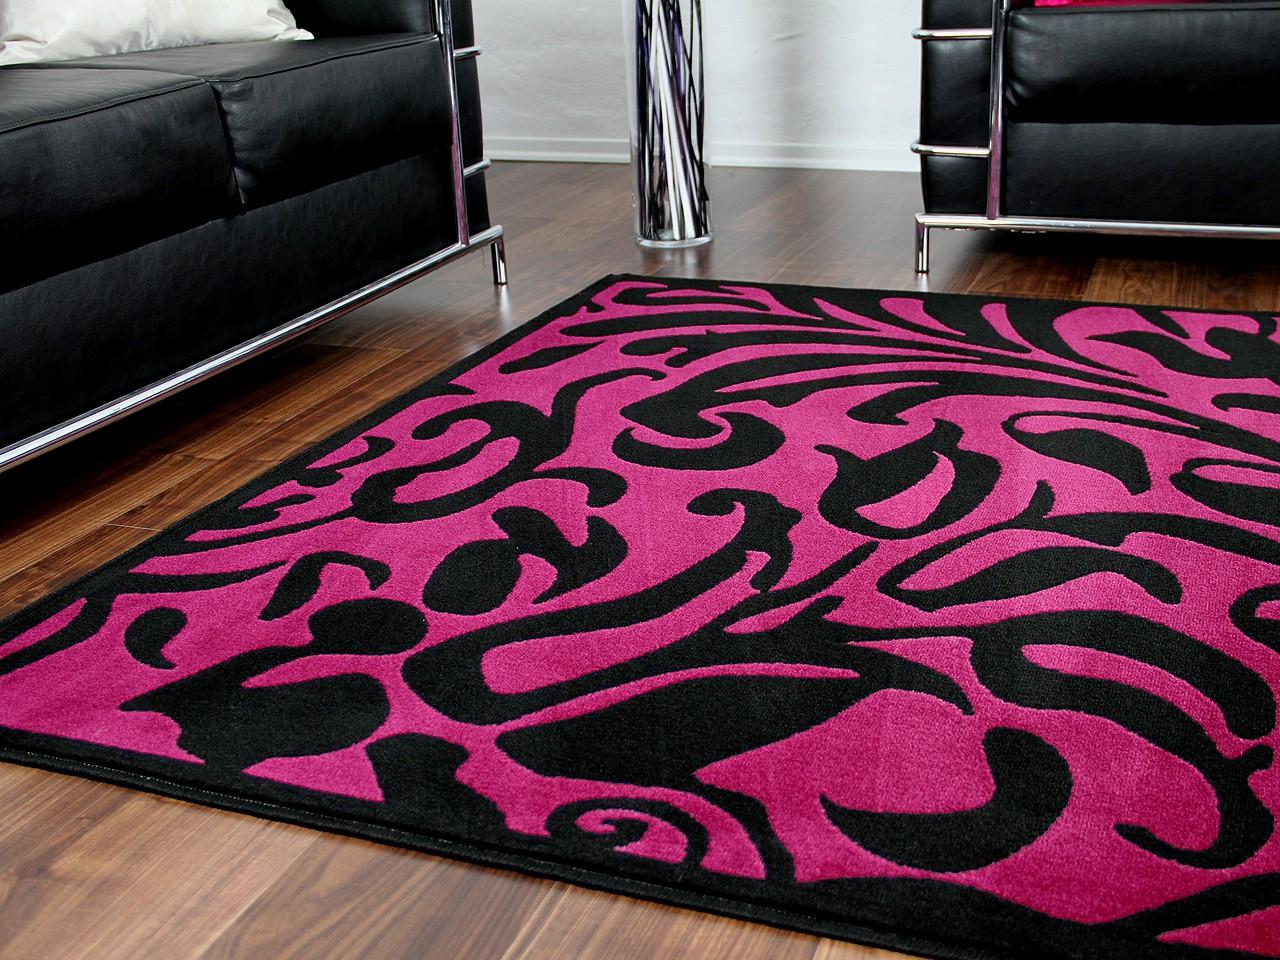 designer teppich passion schwarz lila barock teppiche designerteppiche passion teppiche. Black Bedroom Furniture Sets. Home Design Ideas